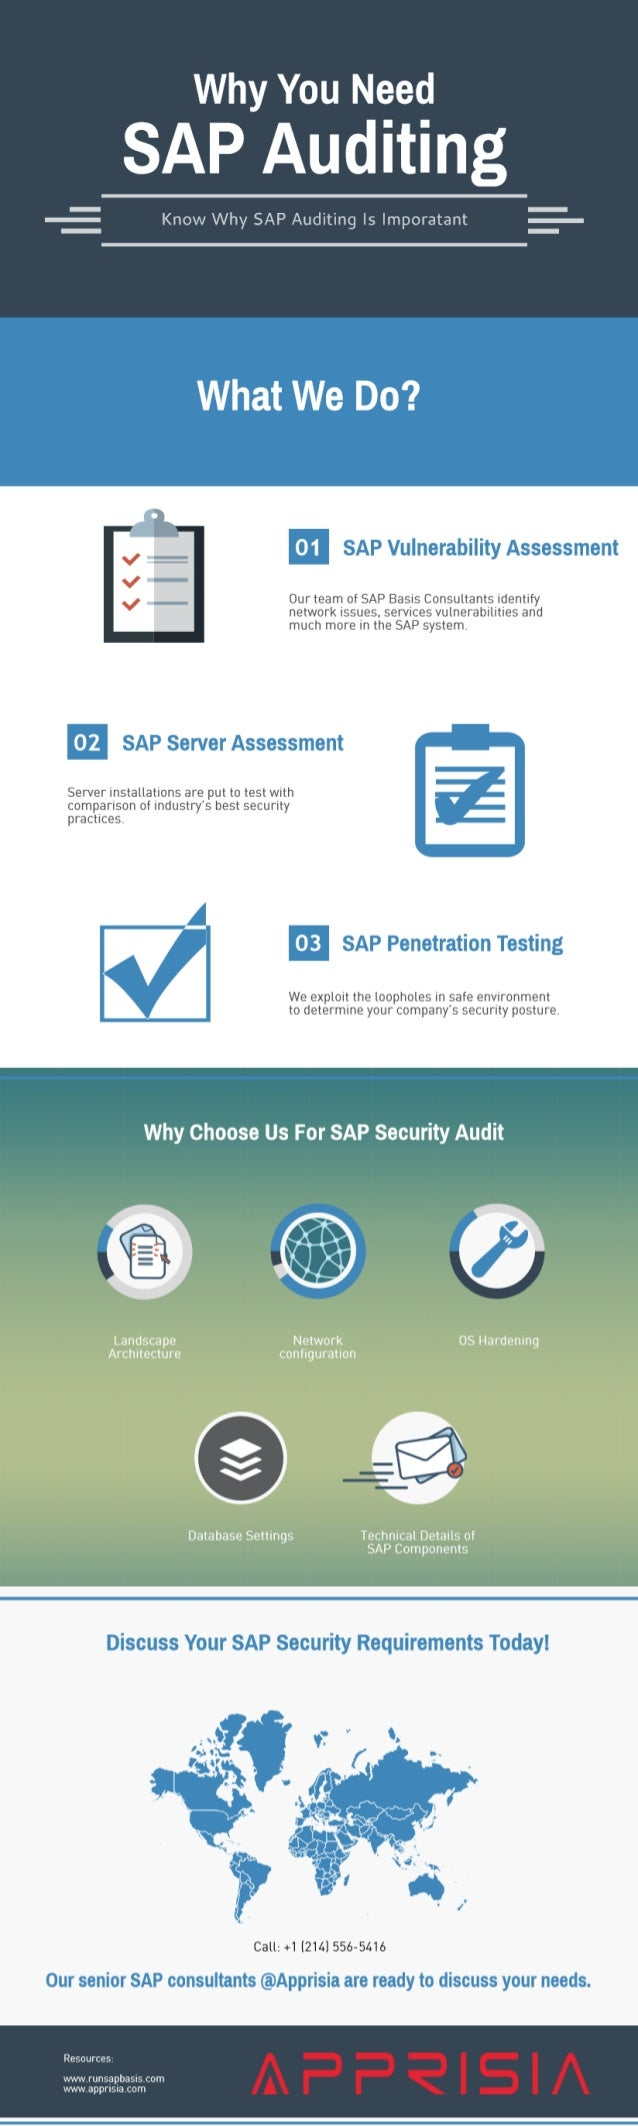 Hire SAP Consultants @Apprisia for SAP Security Audit